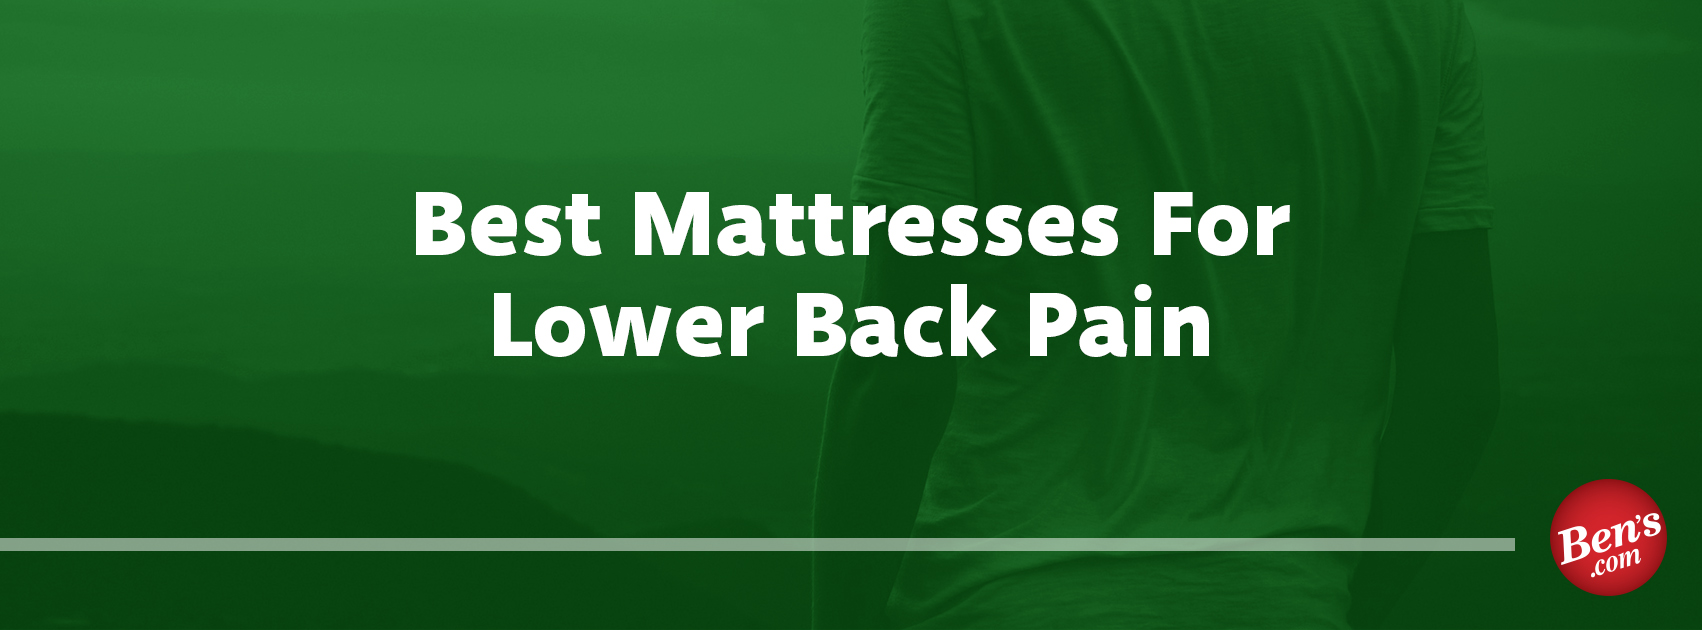 Best Mattresses for Lower Back Pain